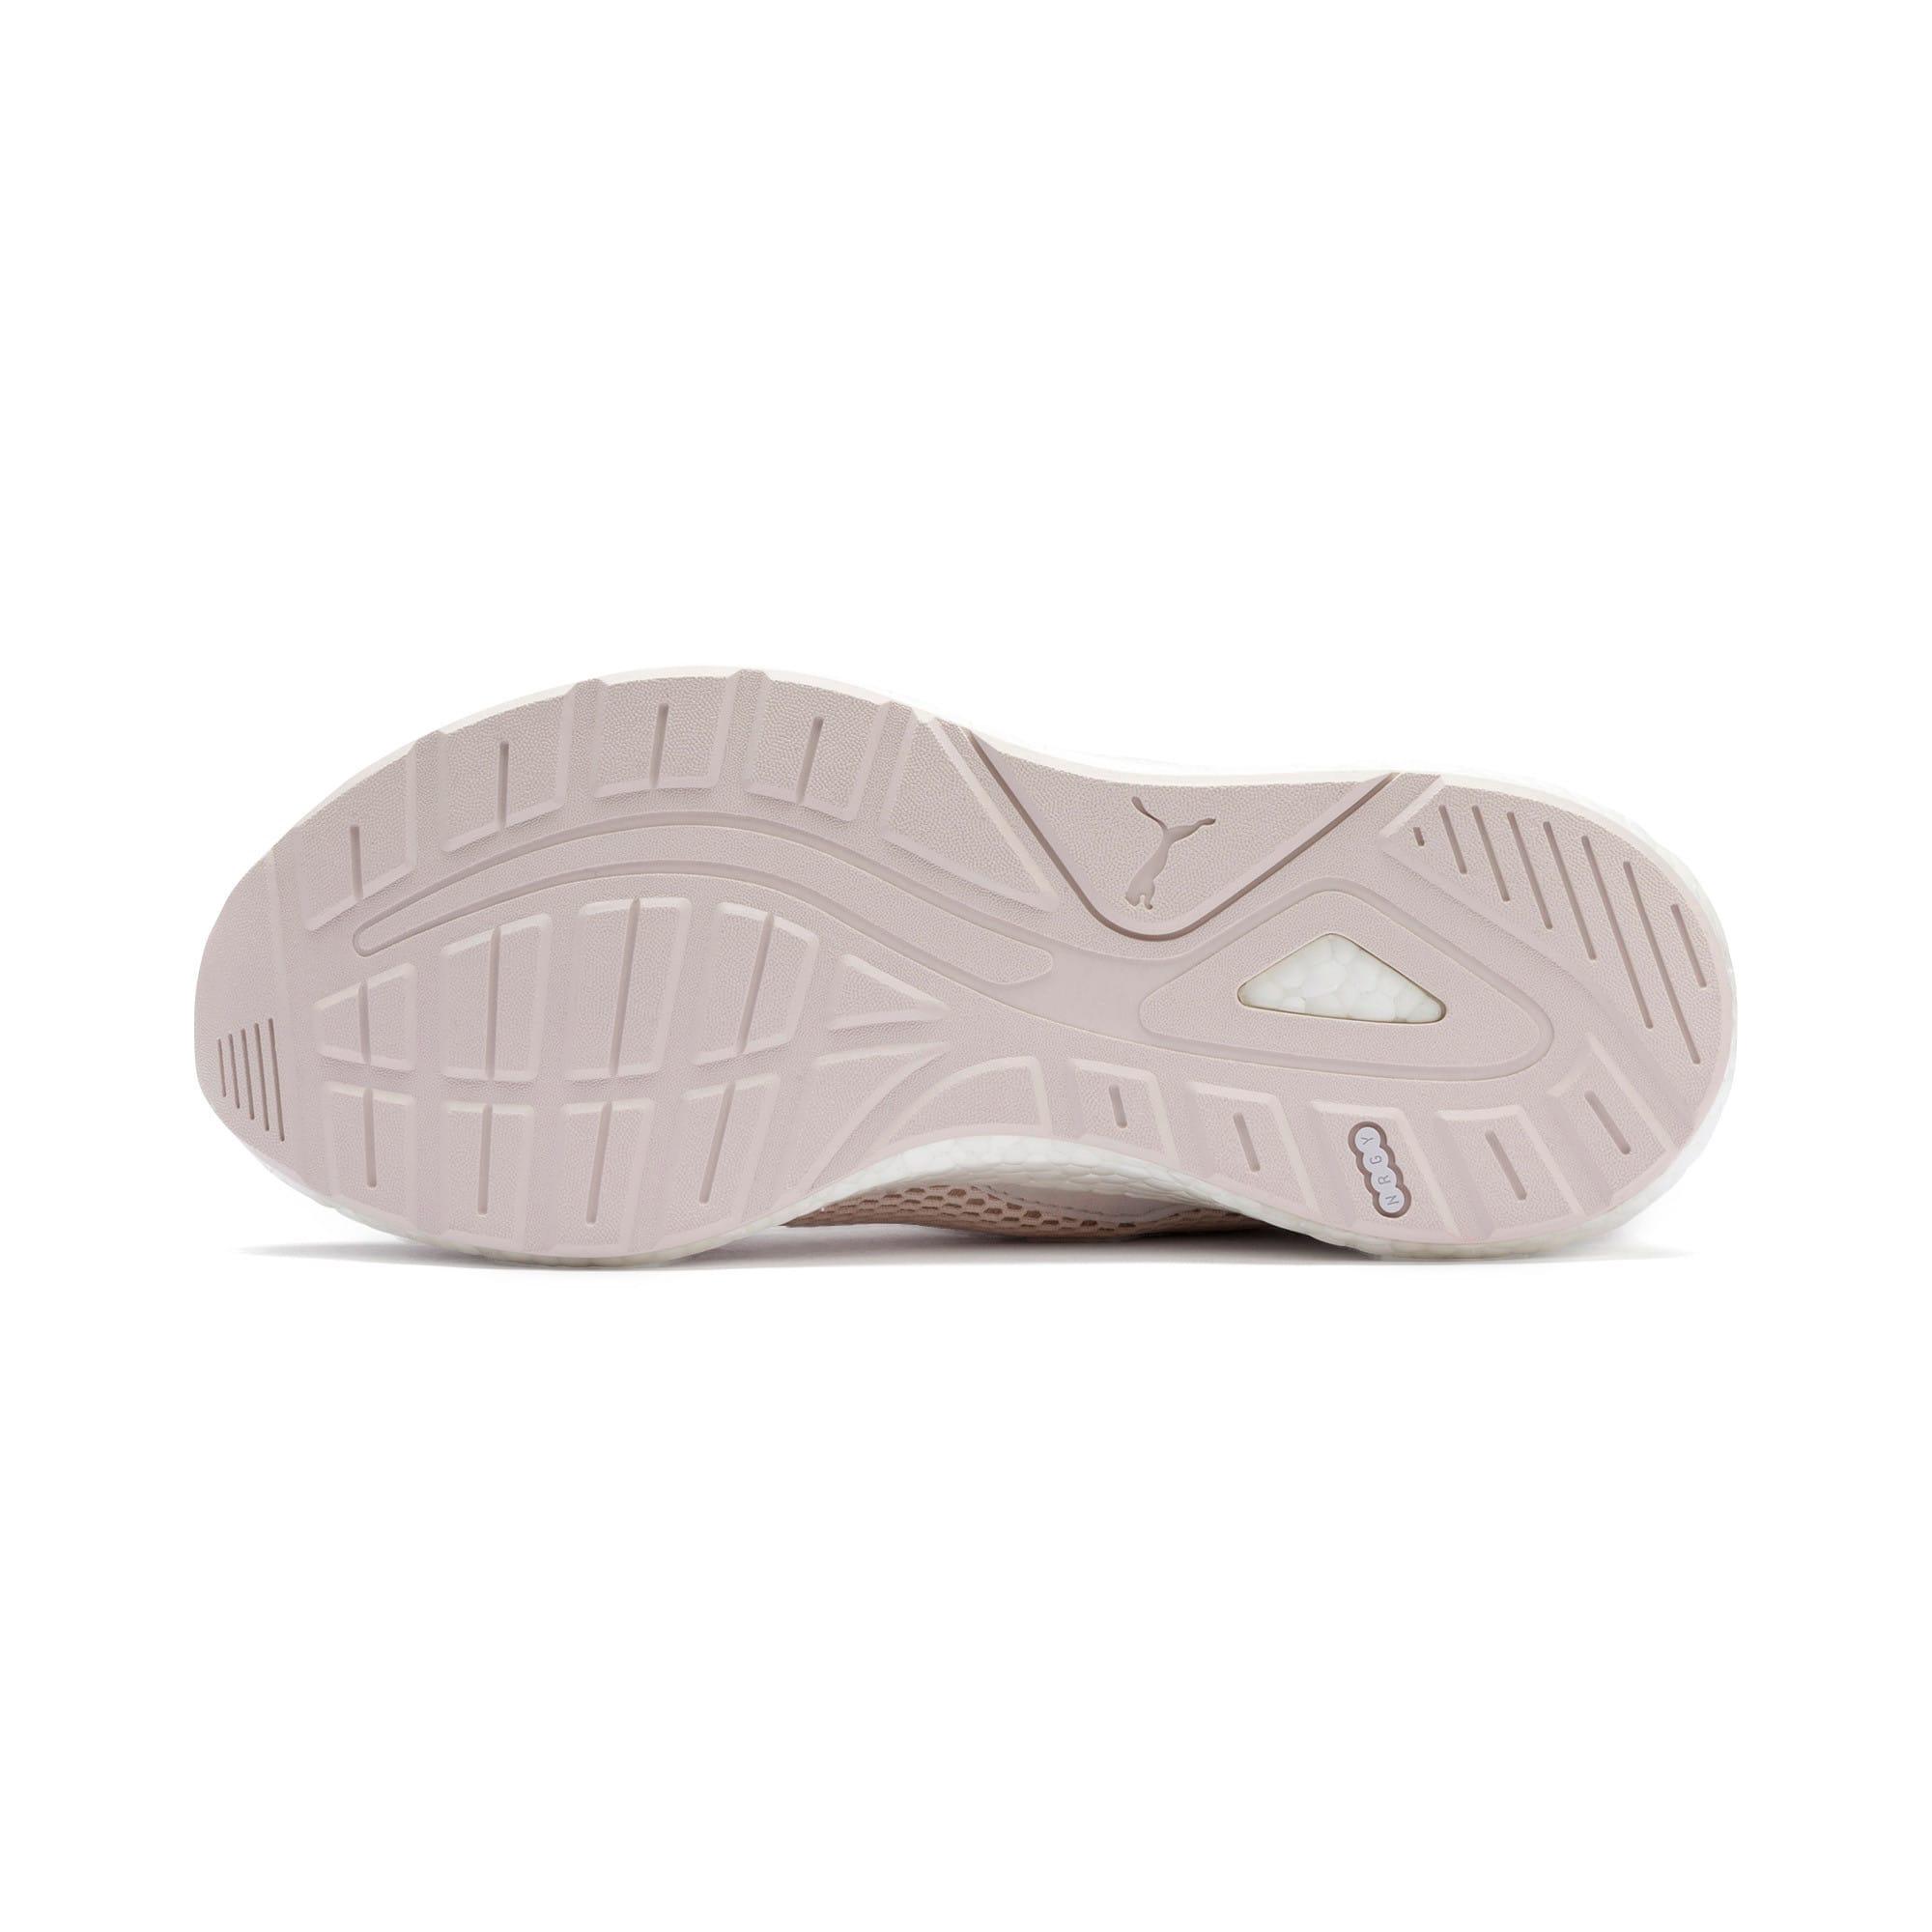 Thumbnail 7 of NRGY Neko Skim Women's Running Shoes, Pastel Parchment-Bridal Rose, medium-IND